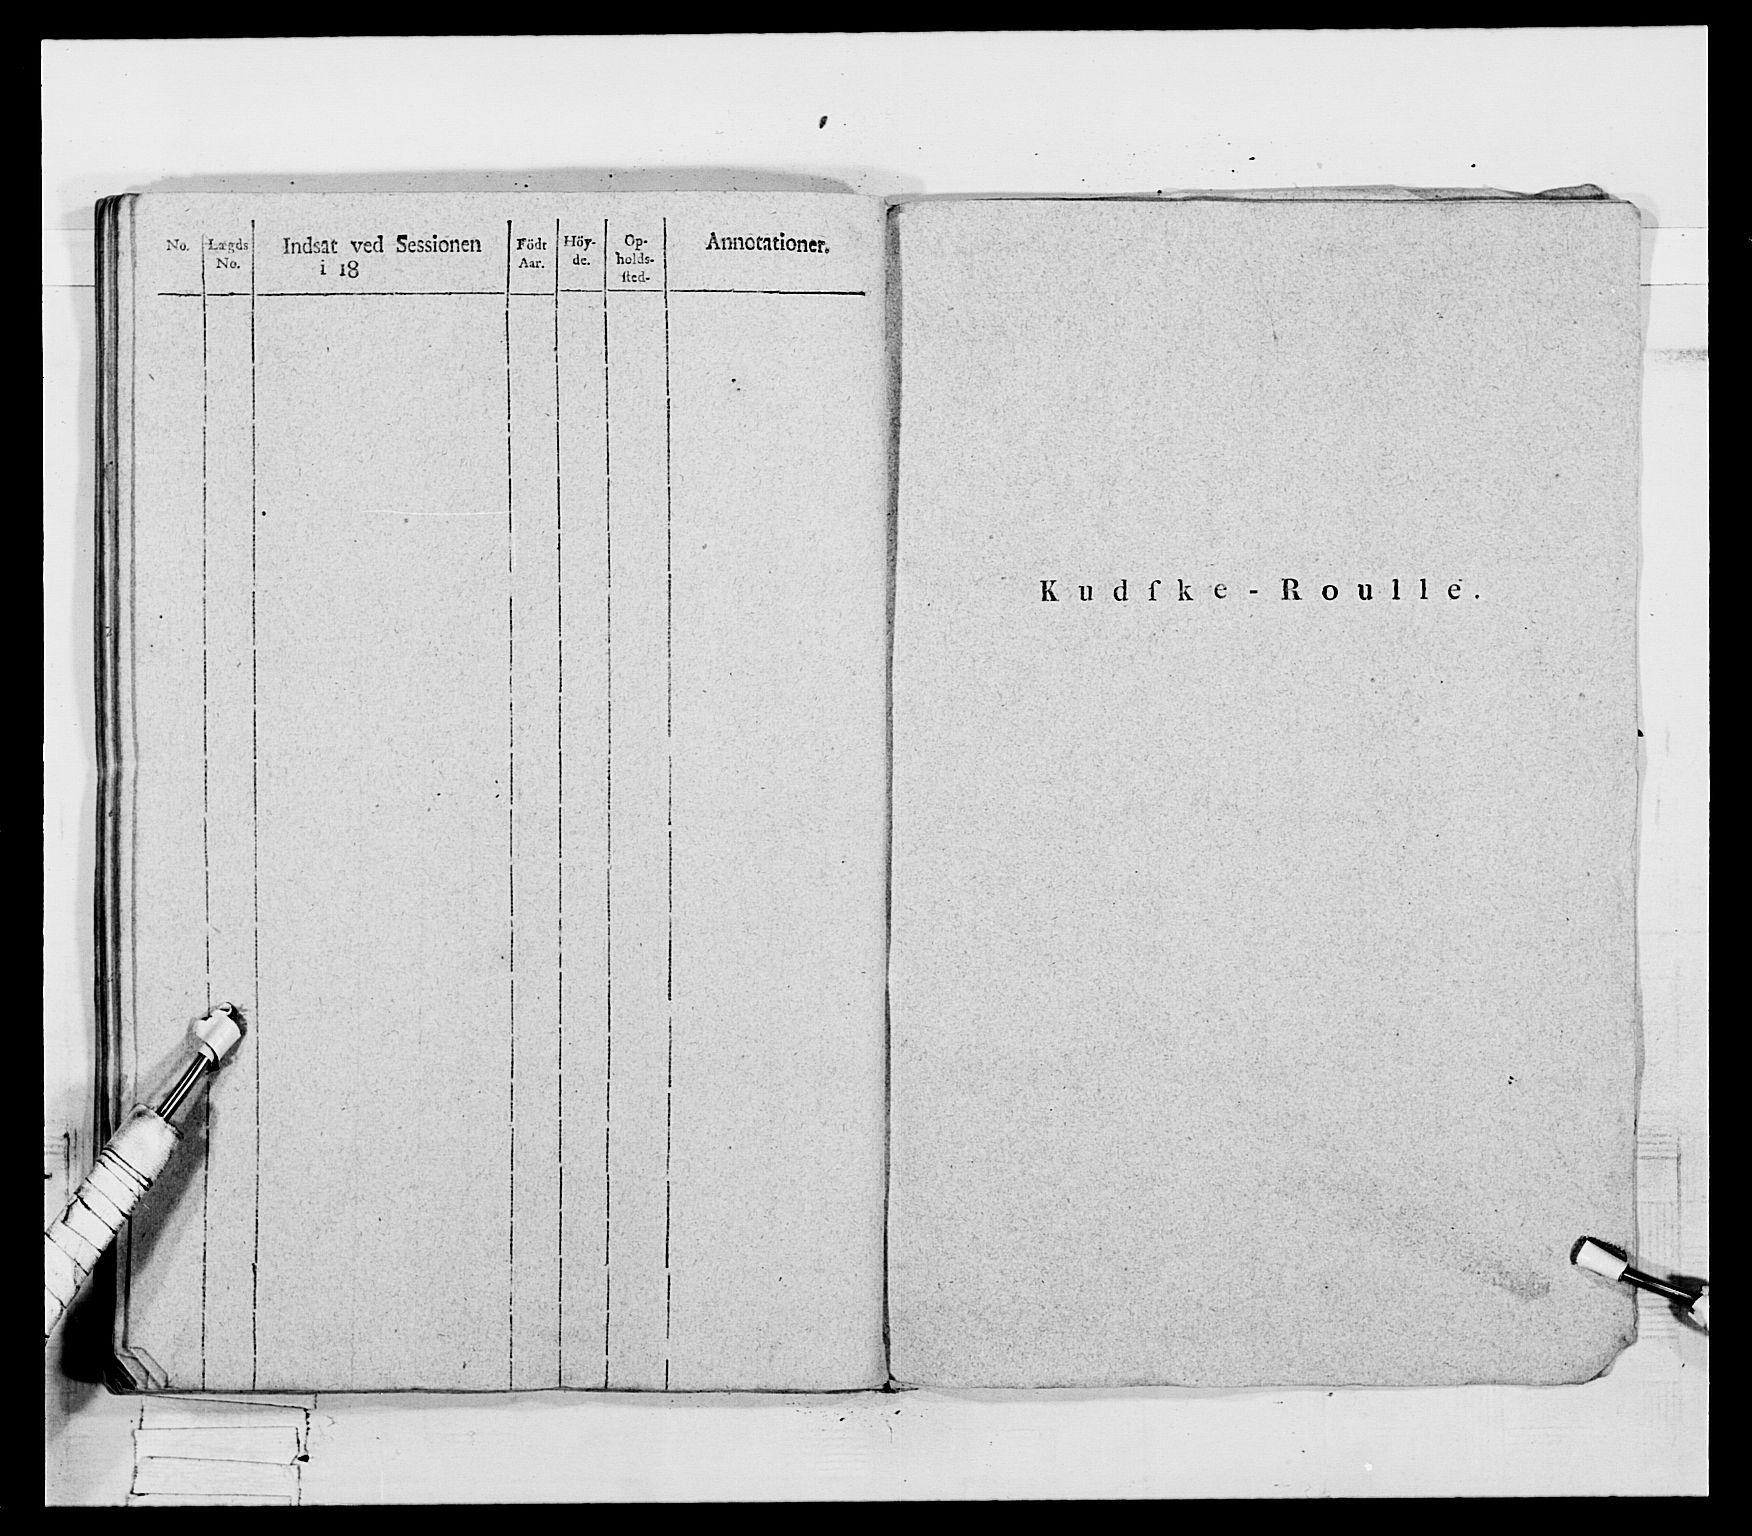 RA, Generalitets- og kommissariatskollegiet, Det kongelige norske kommissariatskollegium, E/Eh/L0069: Opplandske gevorbne infanteriregiment, 1810-1818, p. 311